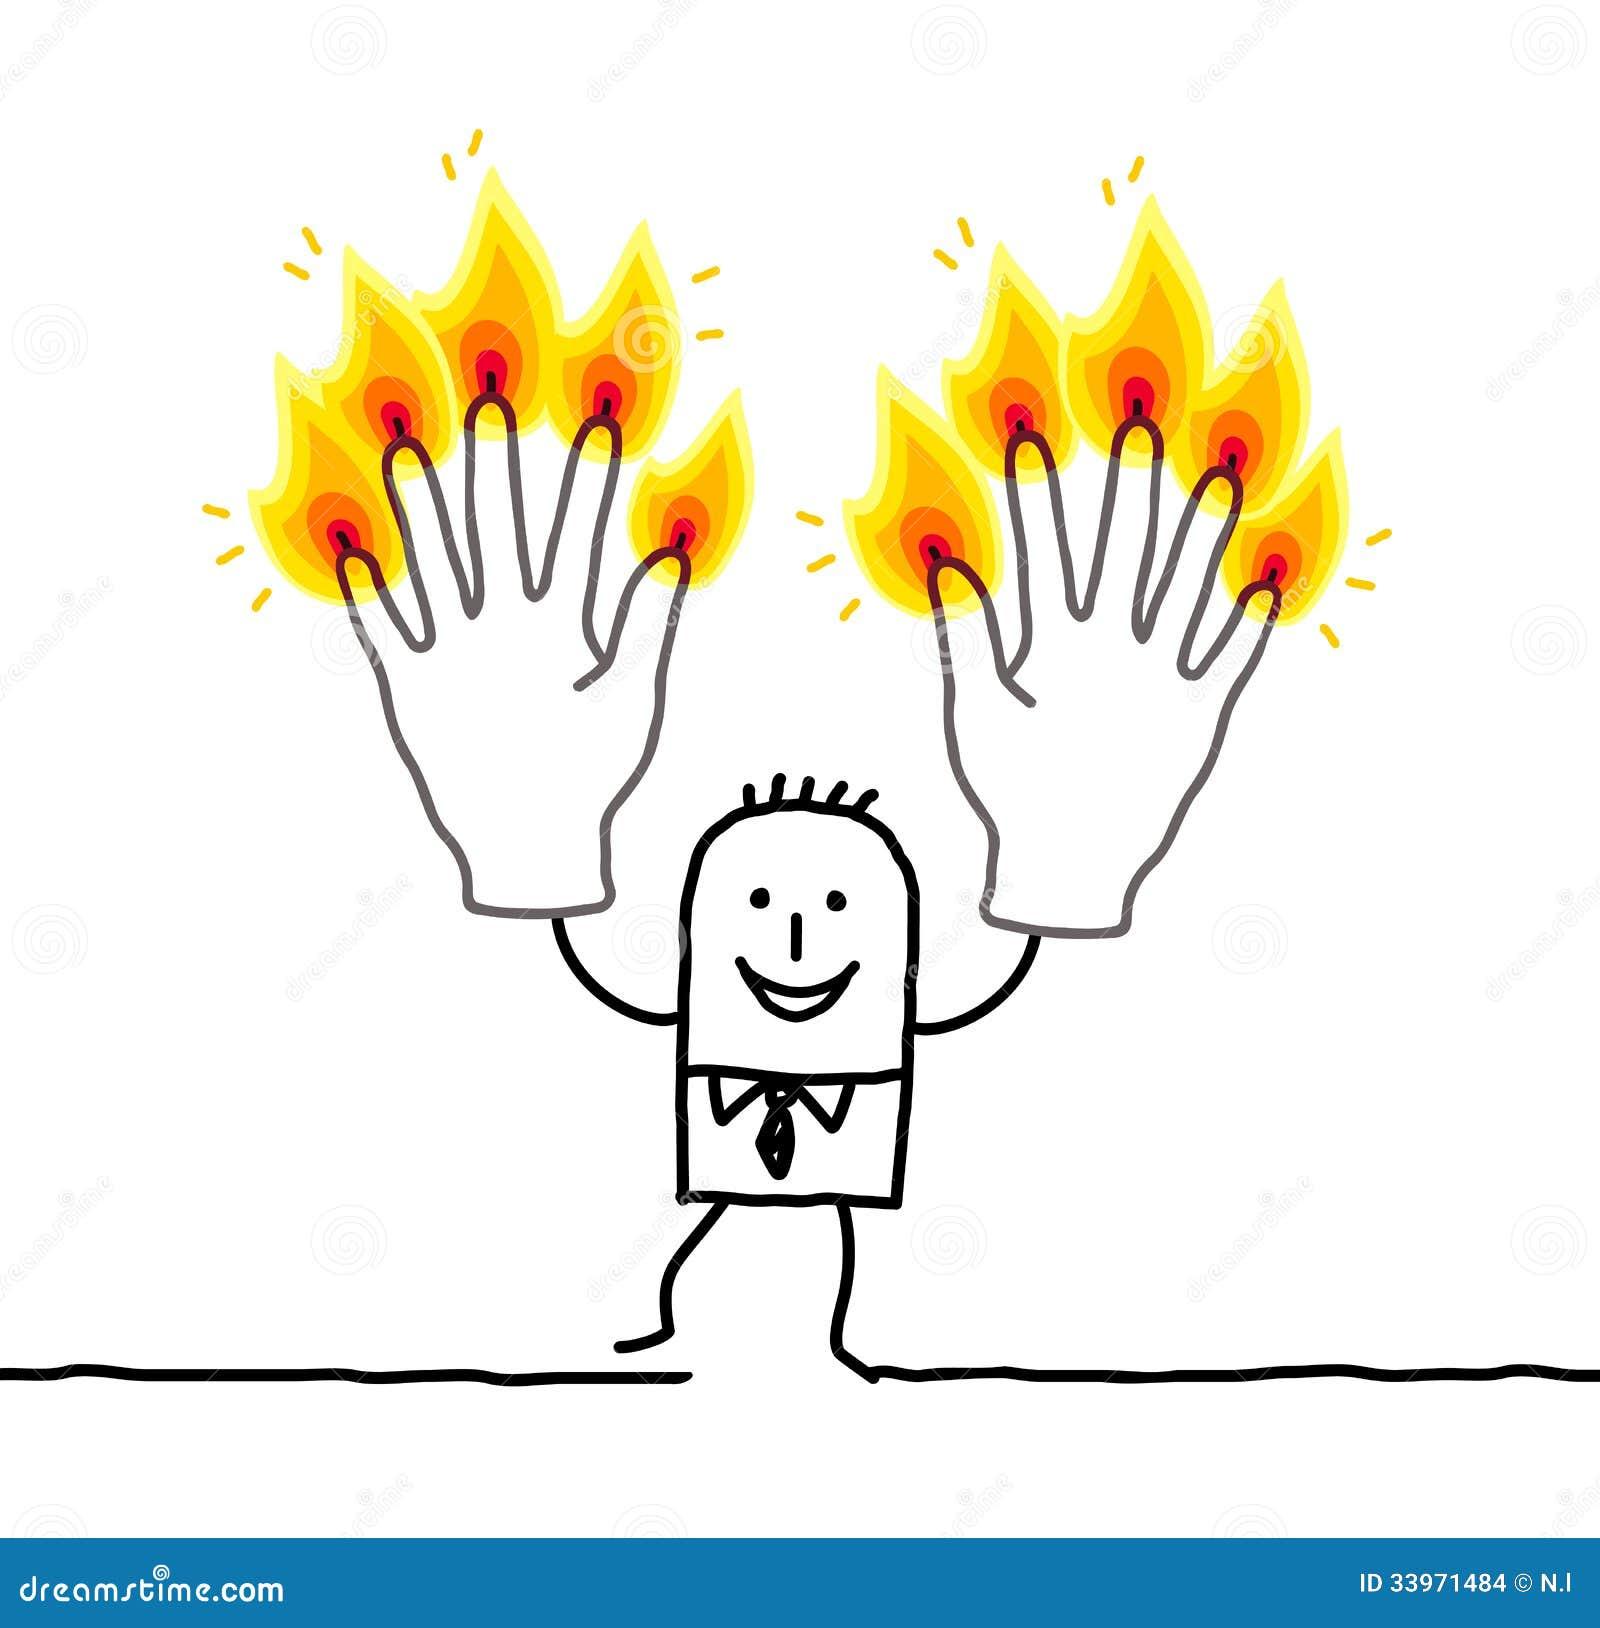 Cartoon Characters 3 Fingers : Man with ten burning fingers stock vector image